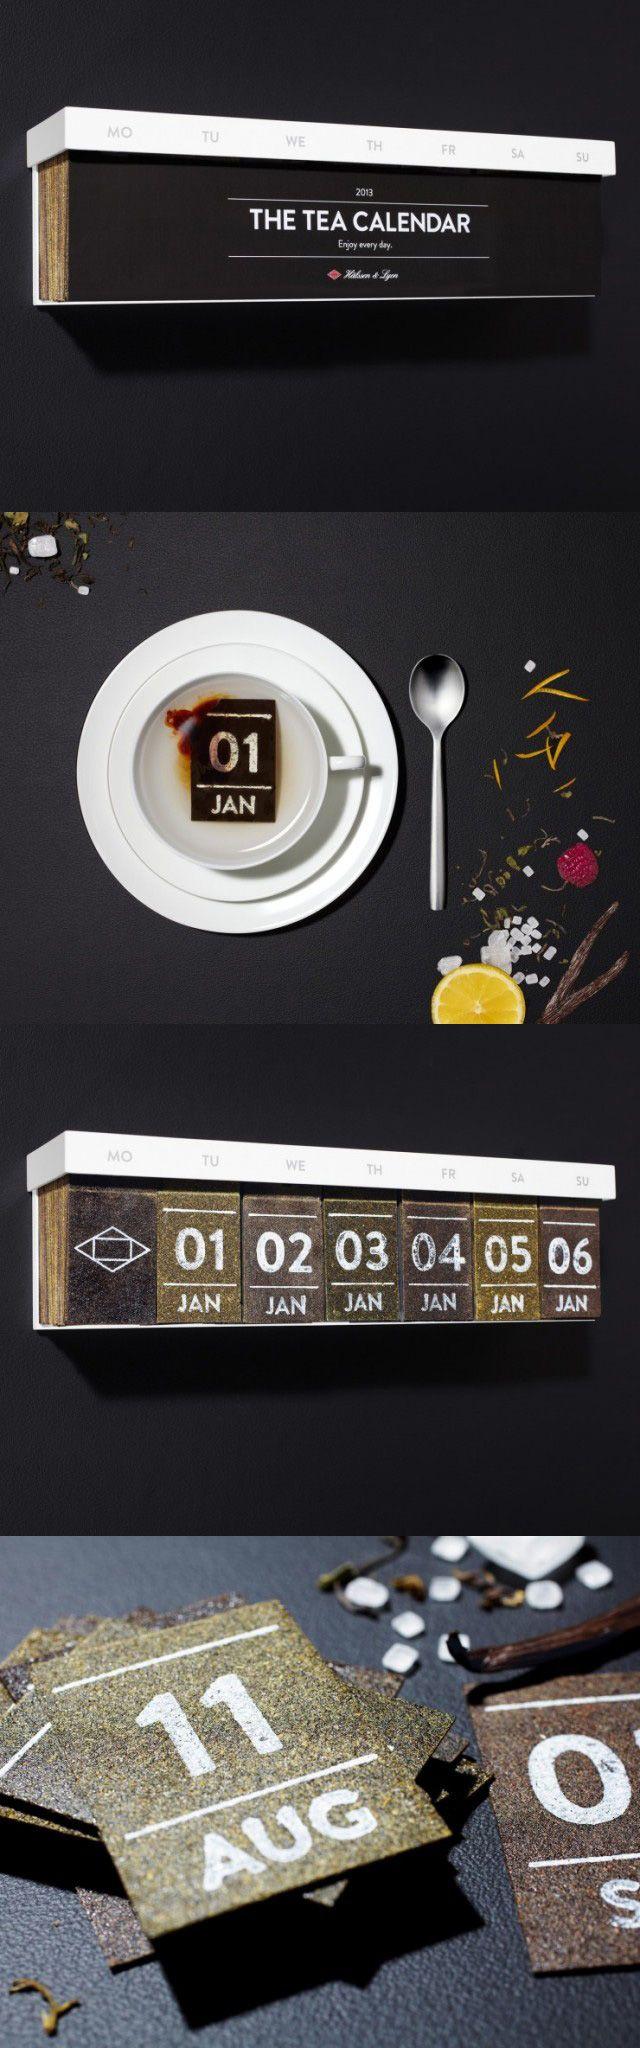 The Tea Calendar PD